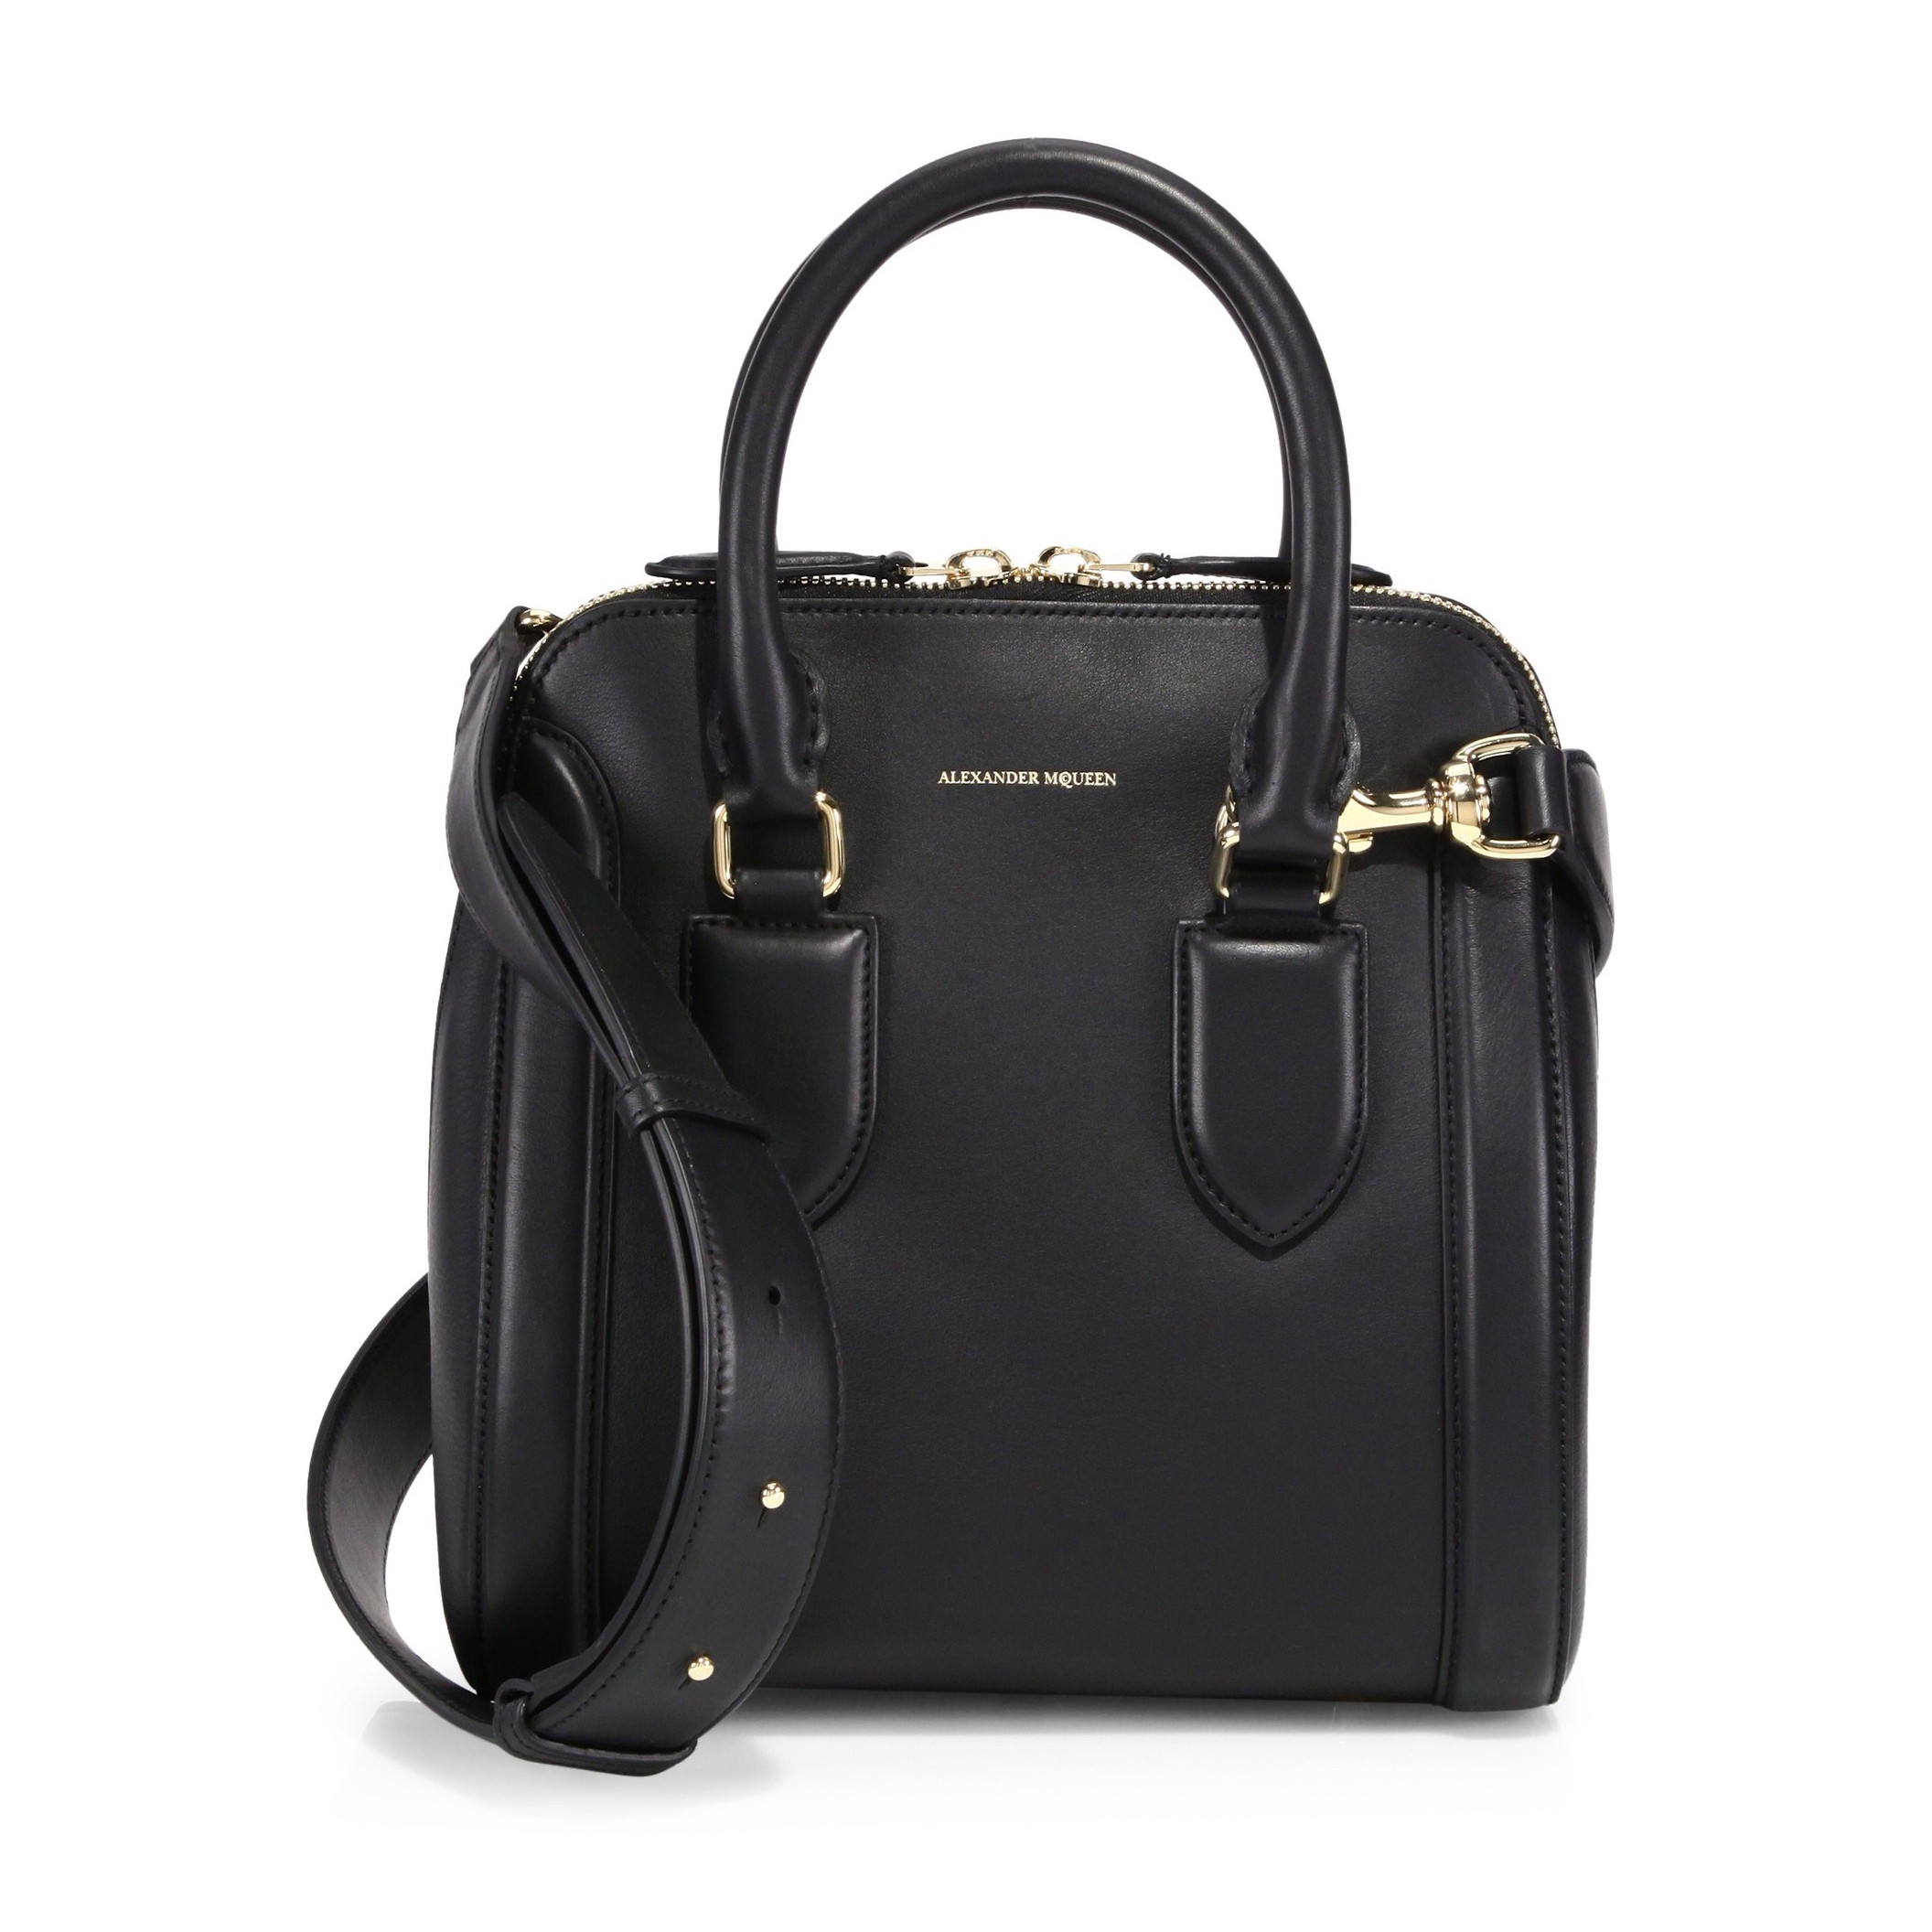 ALEXANDER MCQUEEN Heroine Medium Shoulder Bag in Black